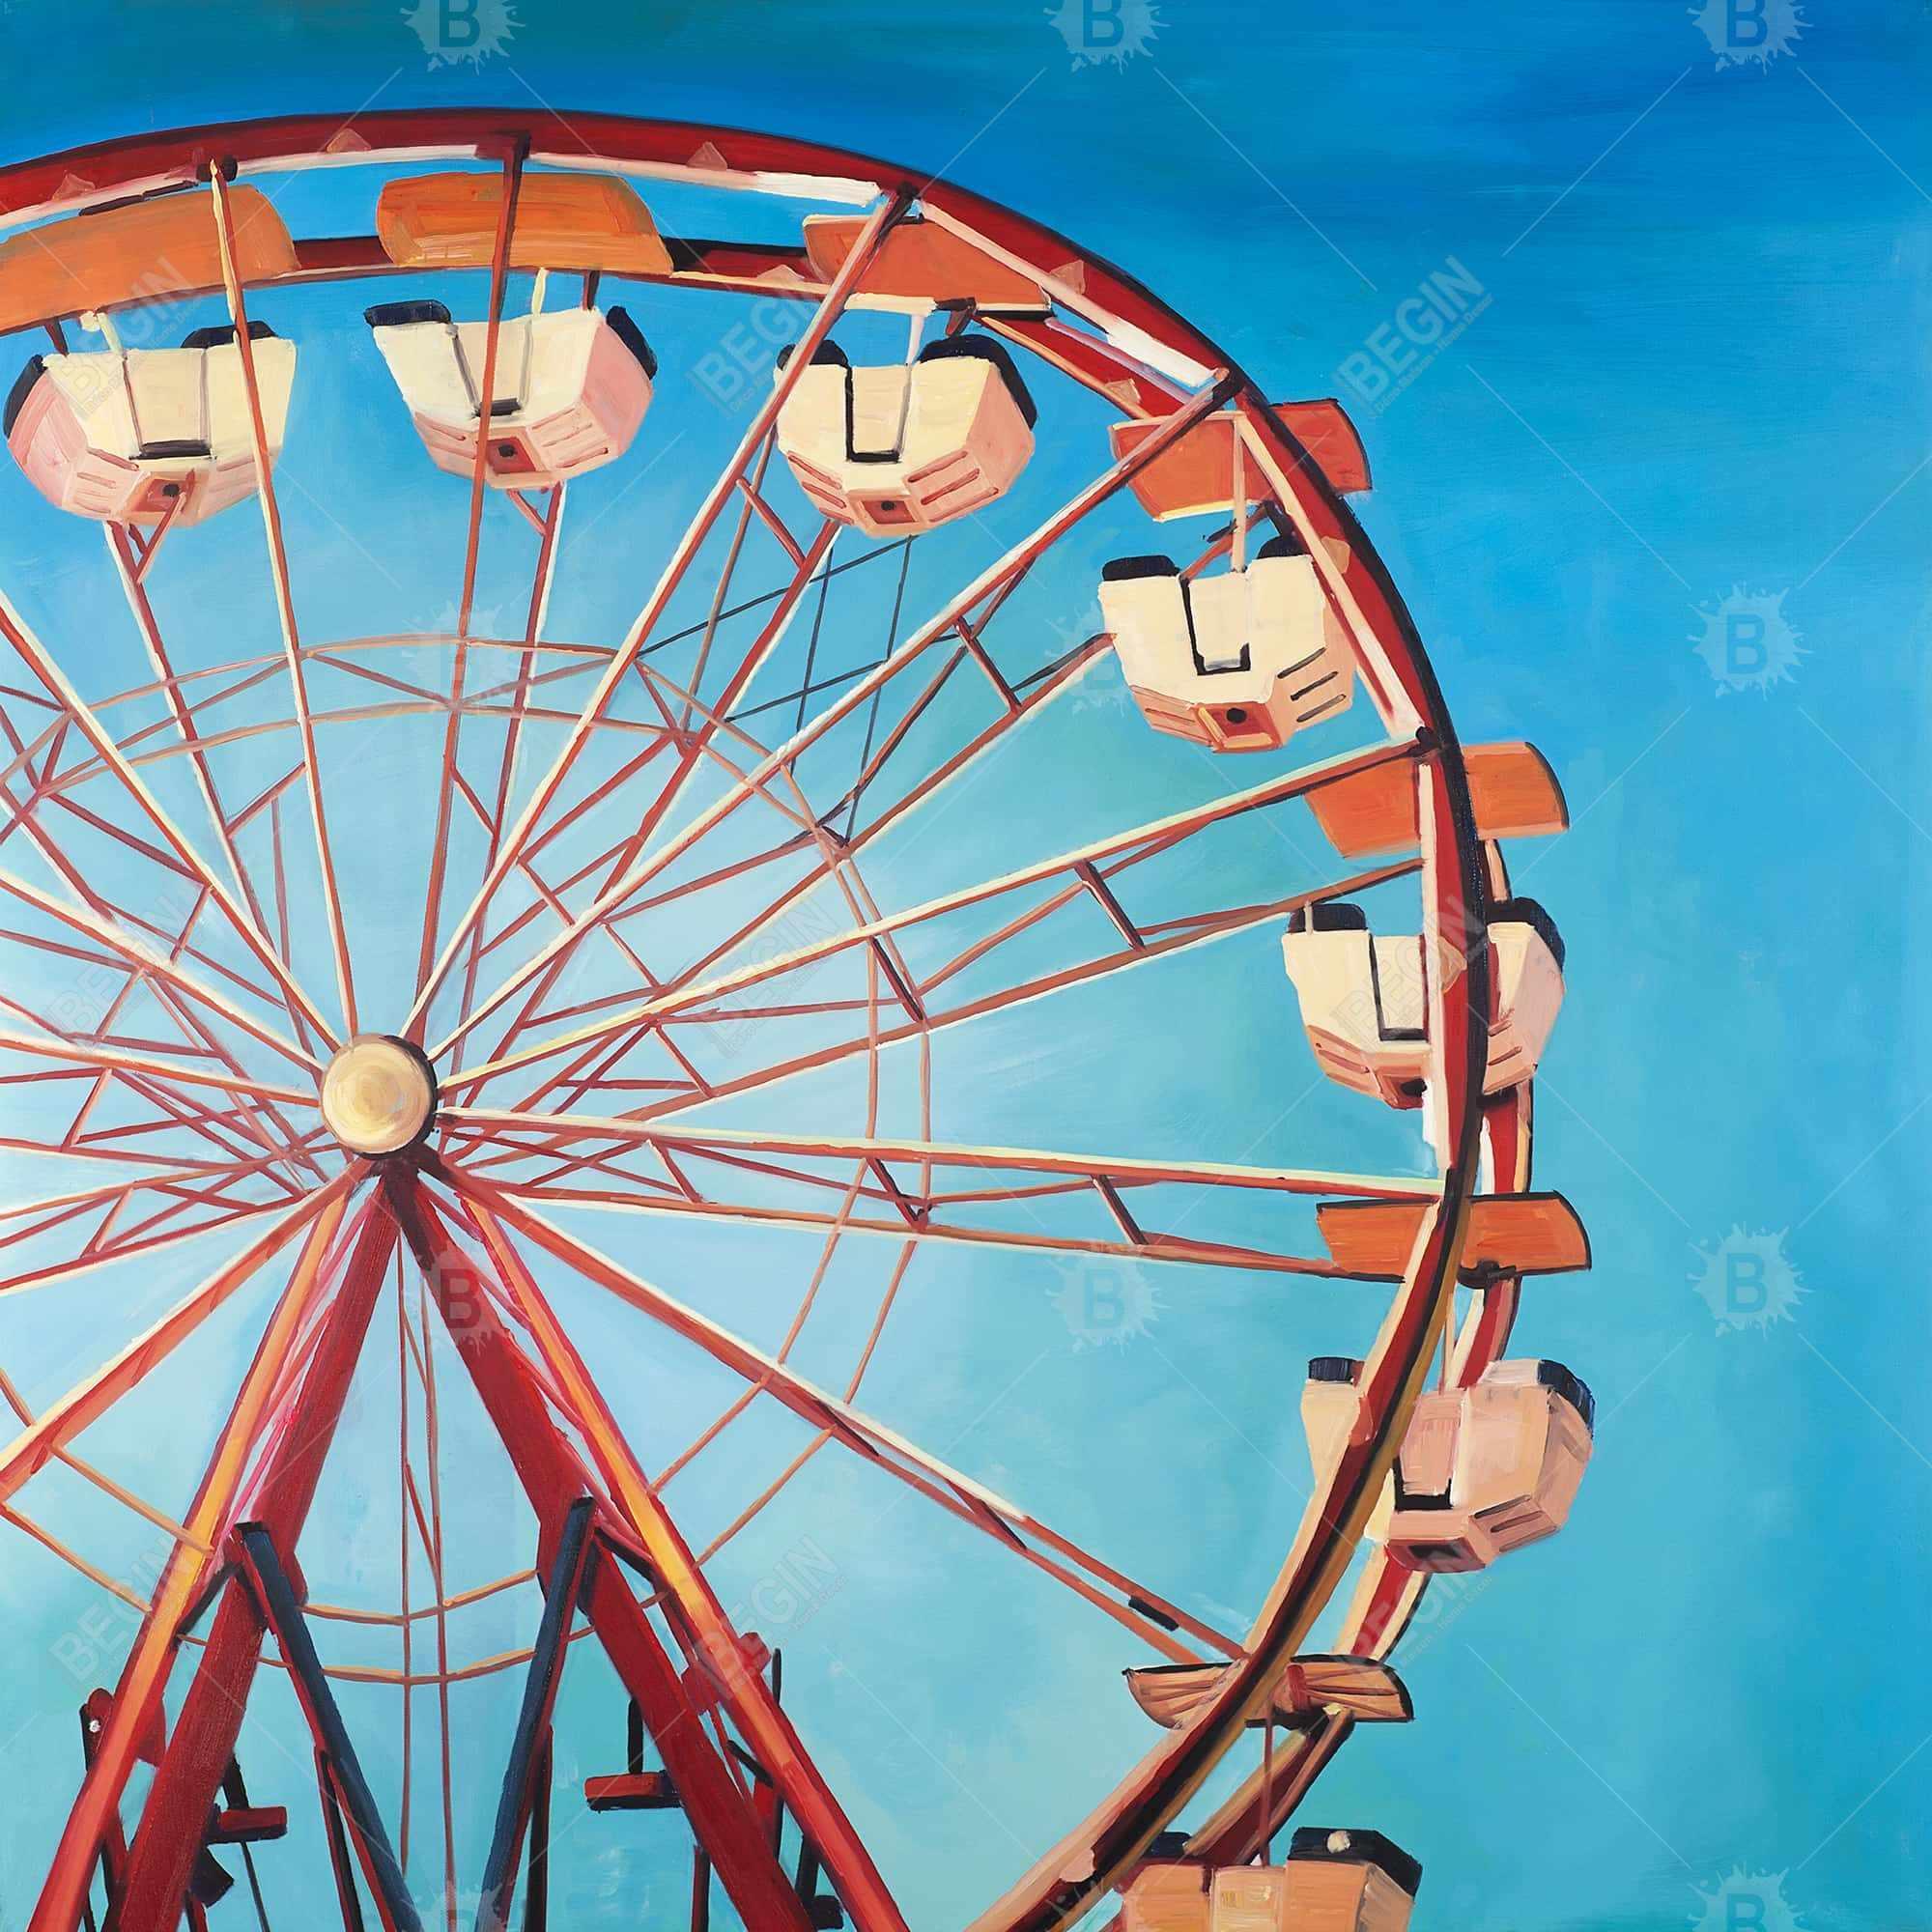 Ferris wheel by a beautiful day